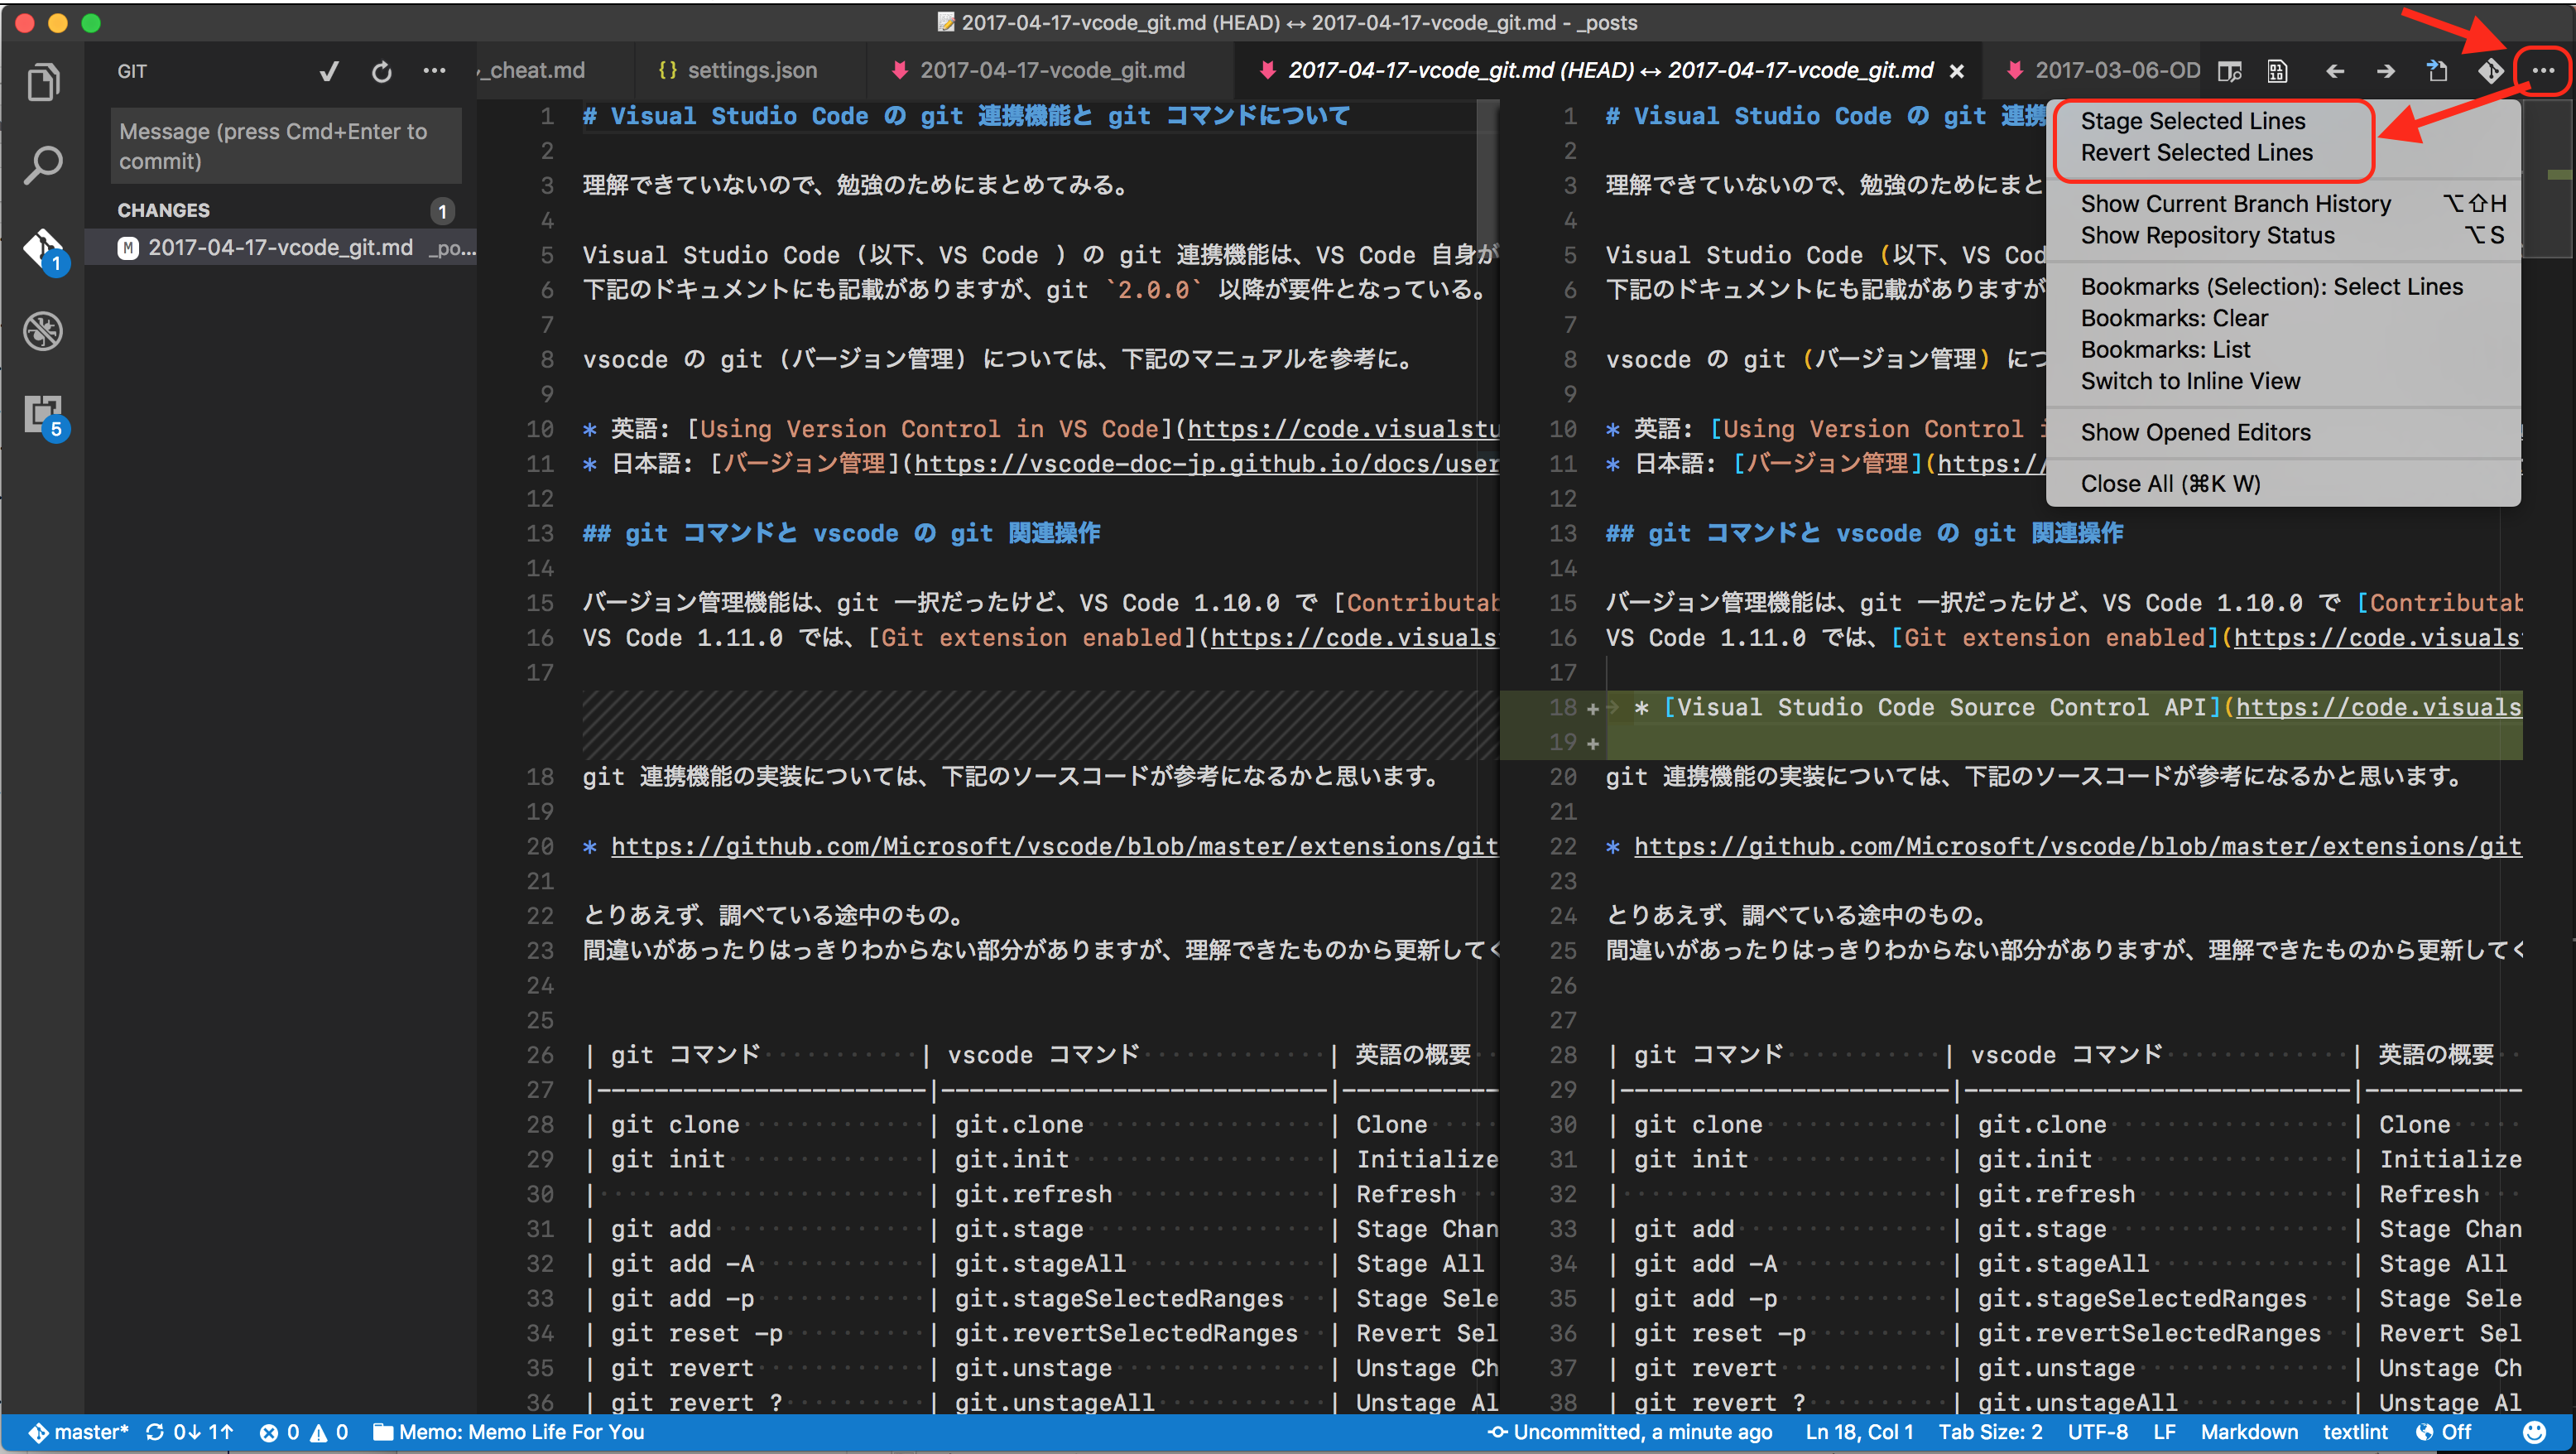 Visual Studio Code の git 連携機能と git コマンドについて